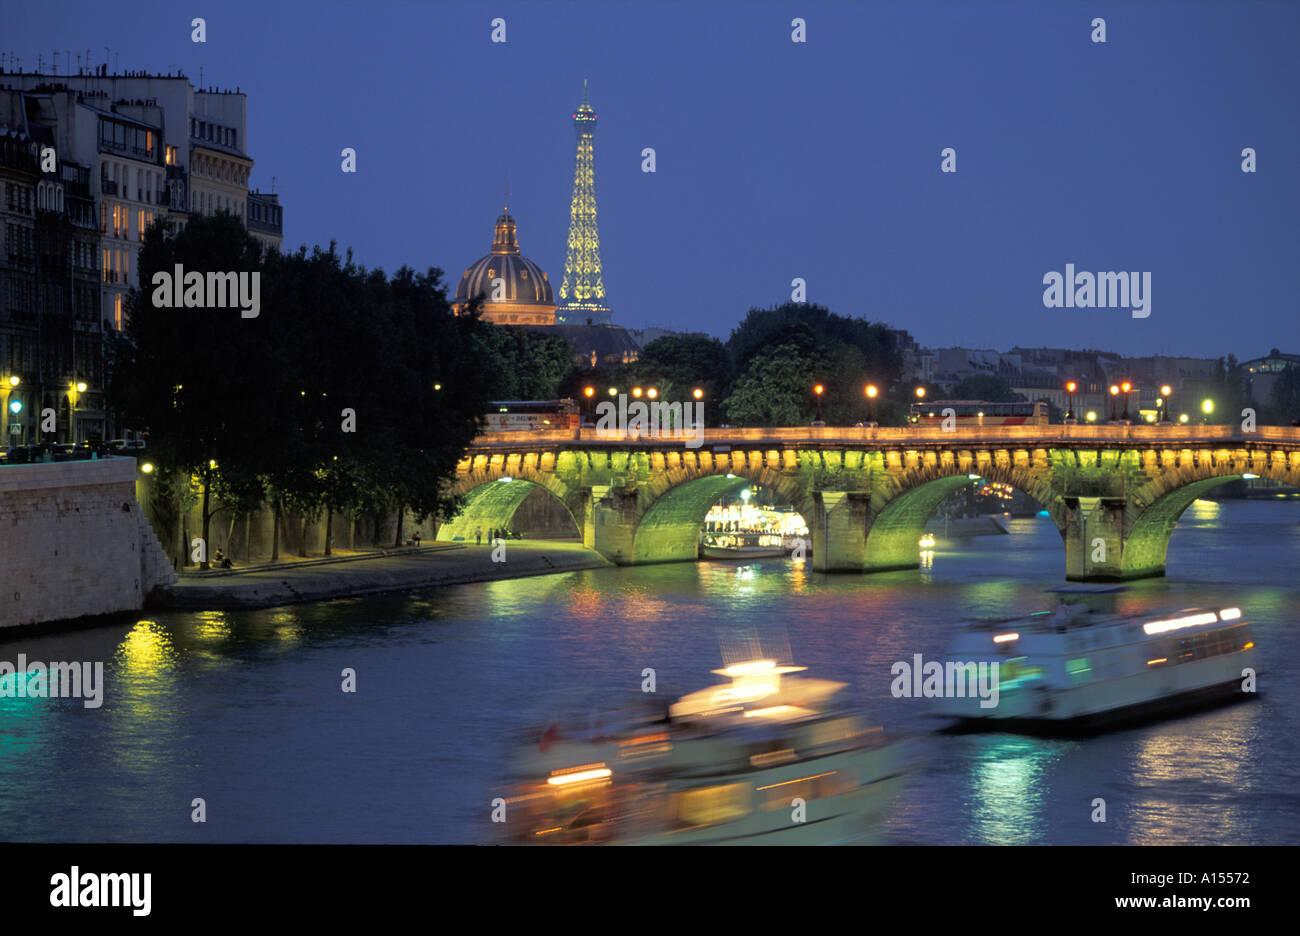 Eiffel Tower River Seine Pont Neuf at Night Paris France - Stock Image